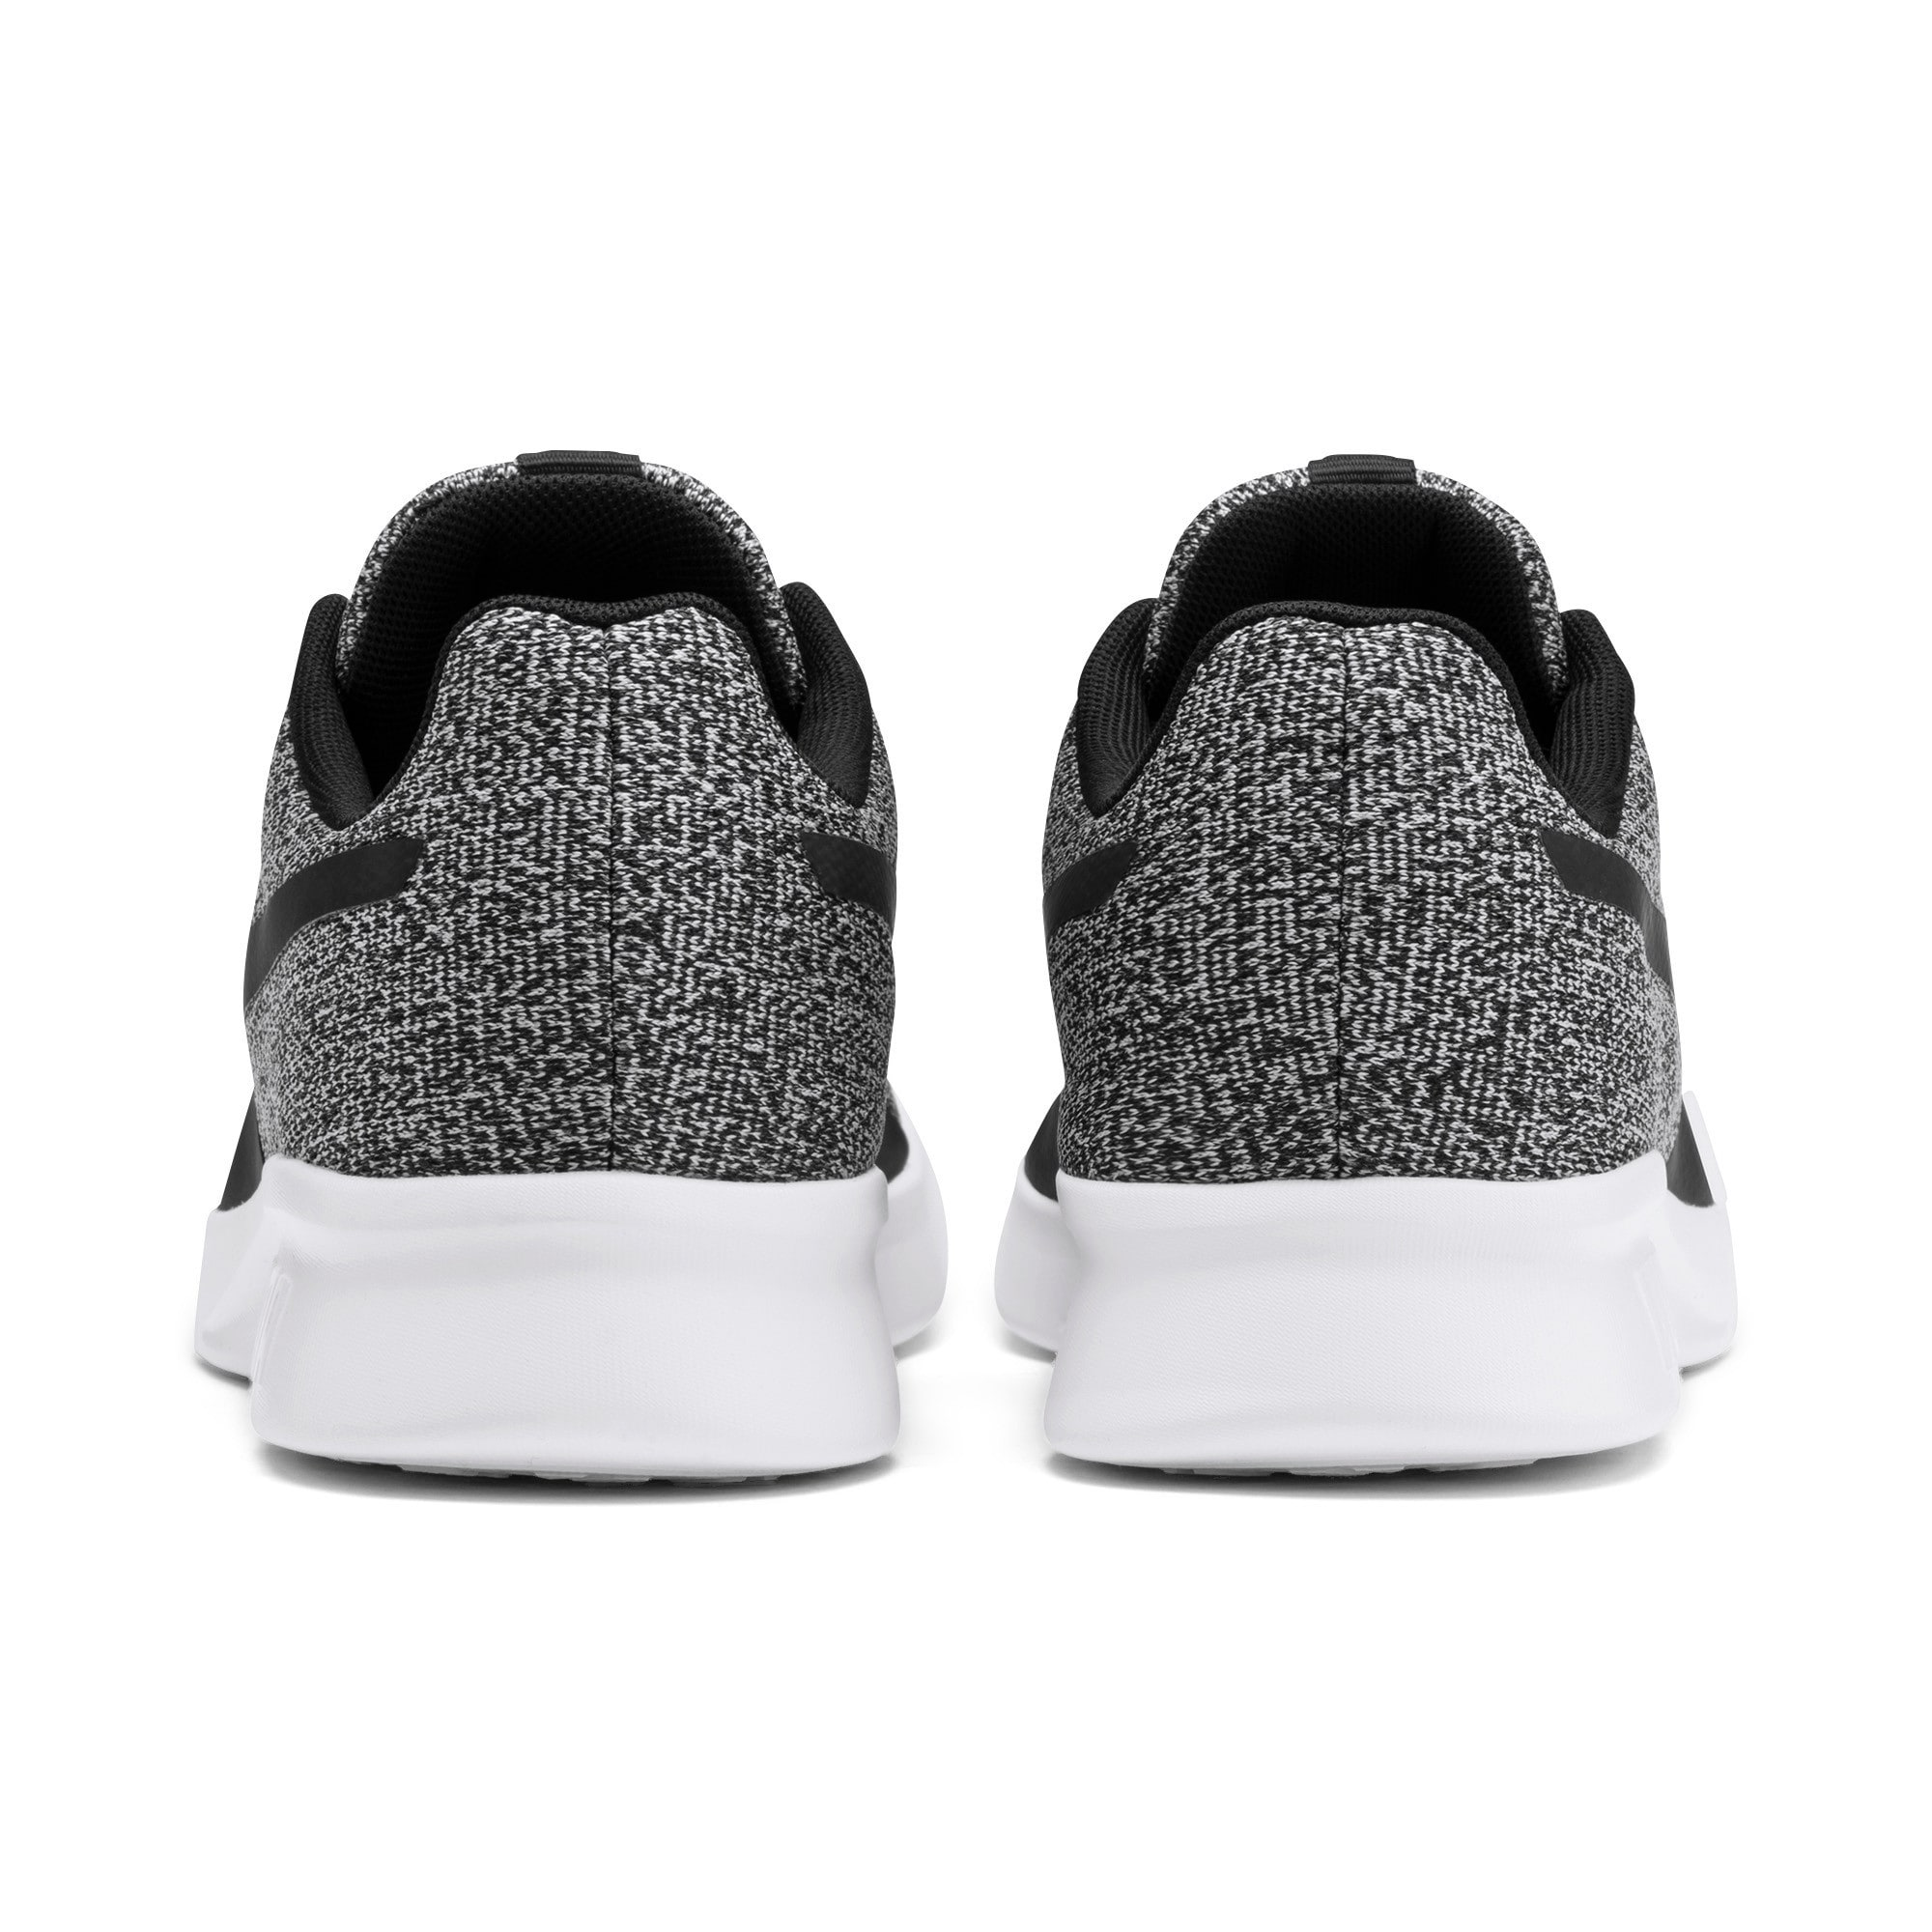 Thumbnail 5 of Modern Runner Sneakers, Gray Violet-Puma Black, medium-IND